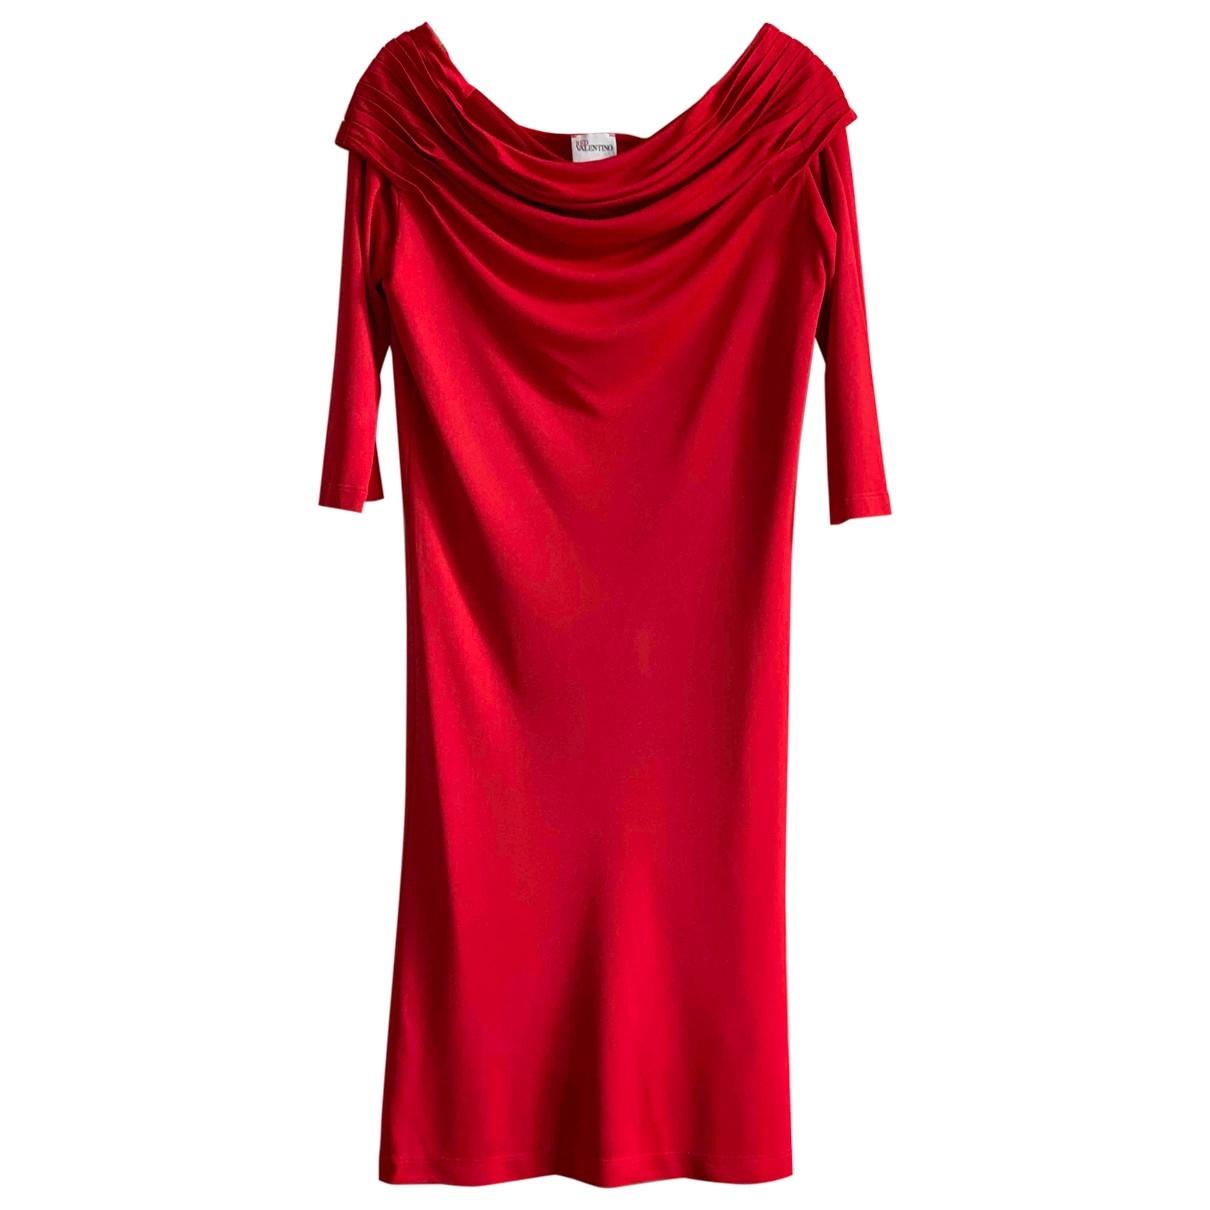 Red Valentino Garavani \N Red dress for Women 38 IT